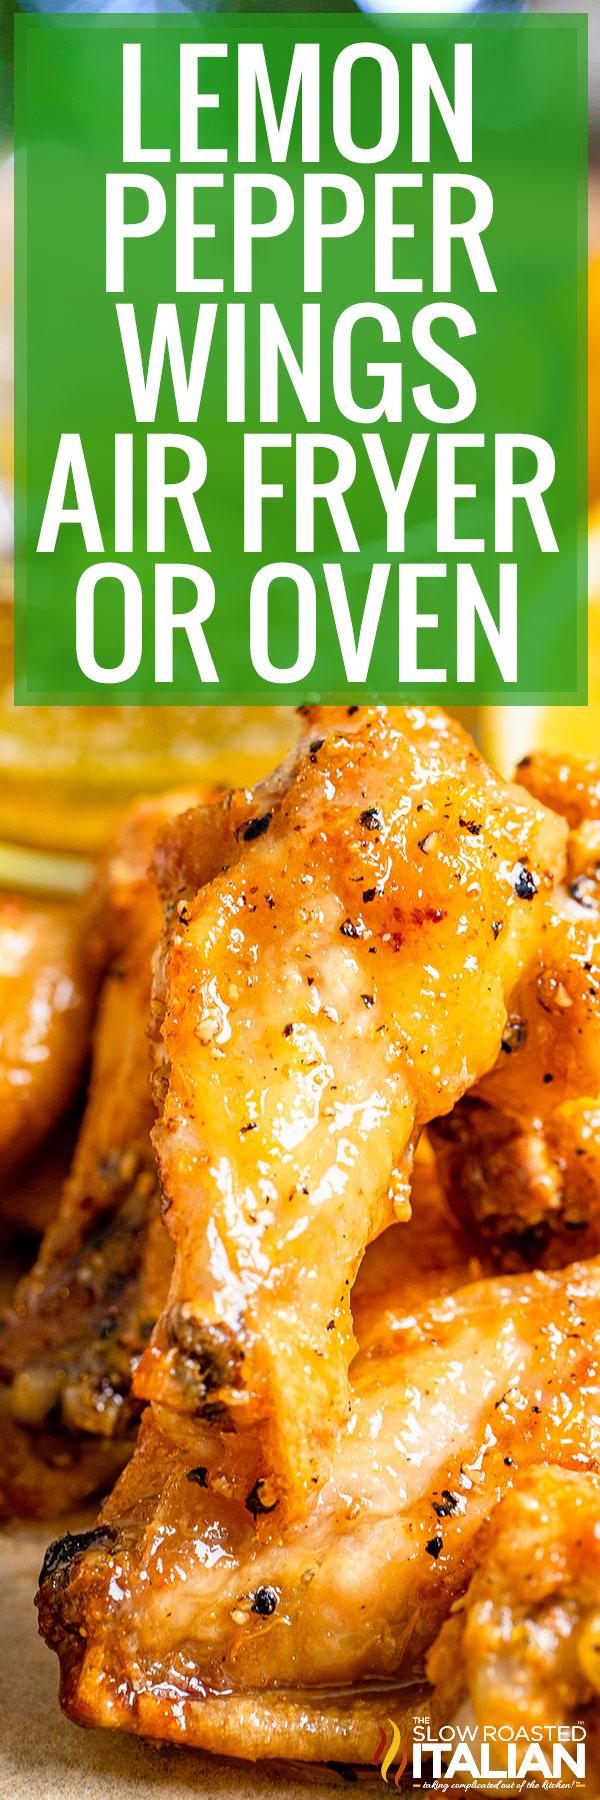 Easy Air Fryer Lemon Pepper Wings Recipe Food Is Four Letter Word